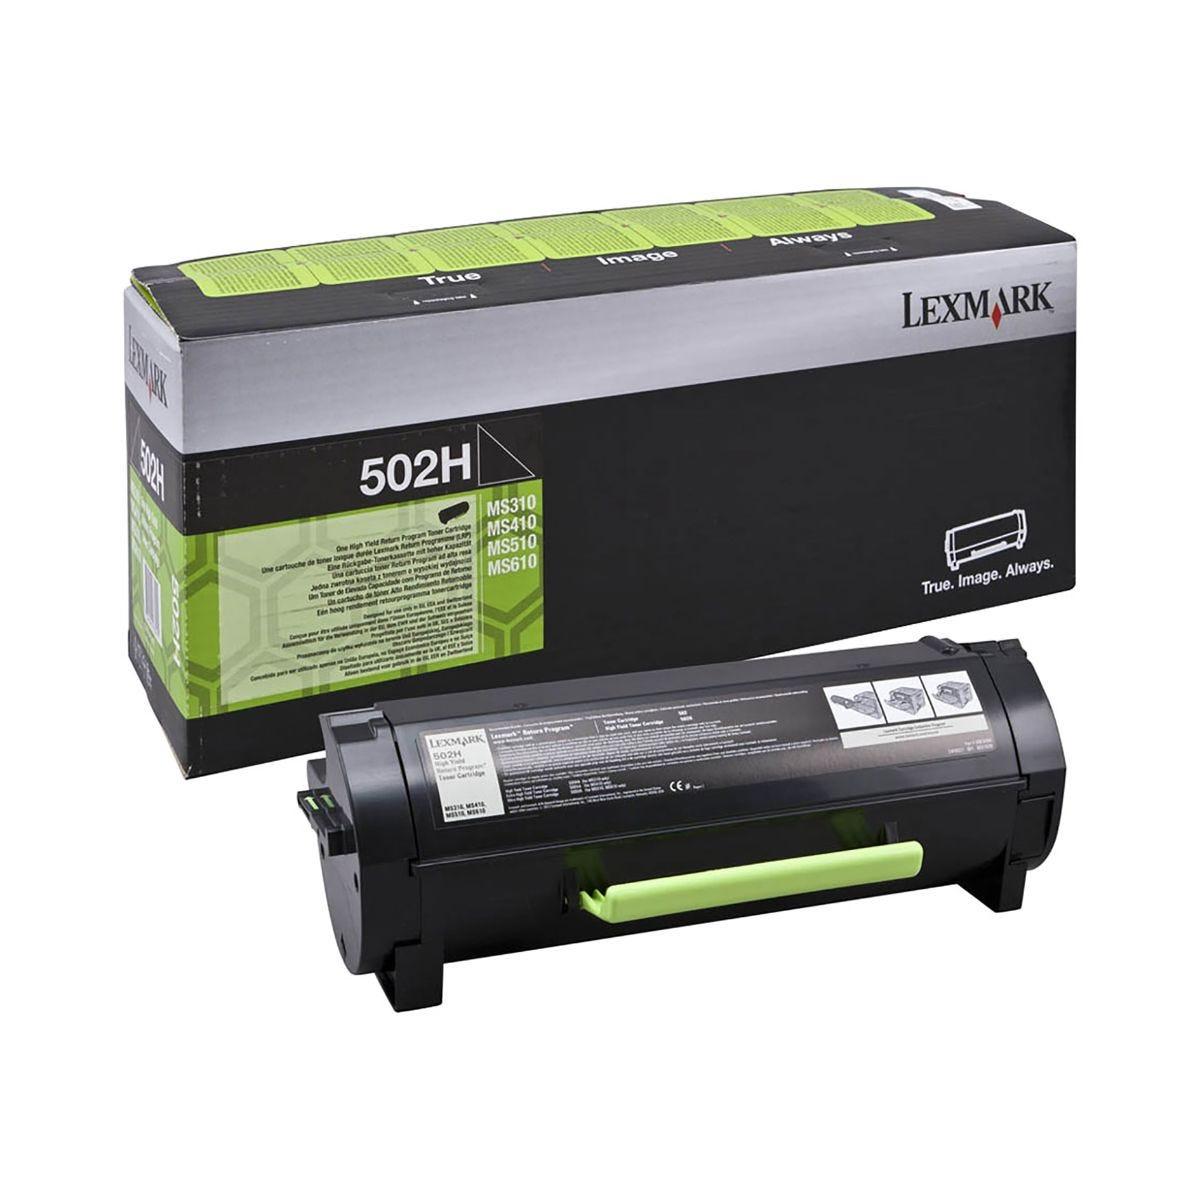 Lexmark 502H Ink Toner Cartridge Black, Black